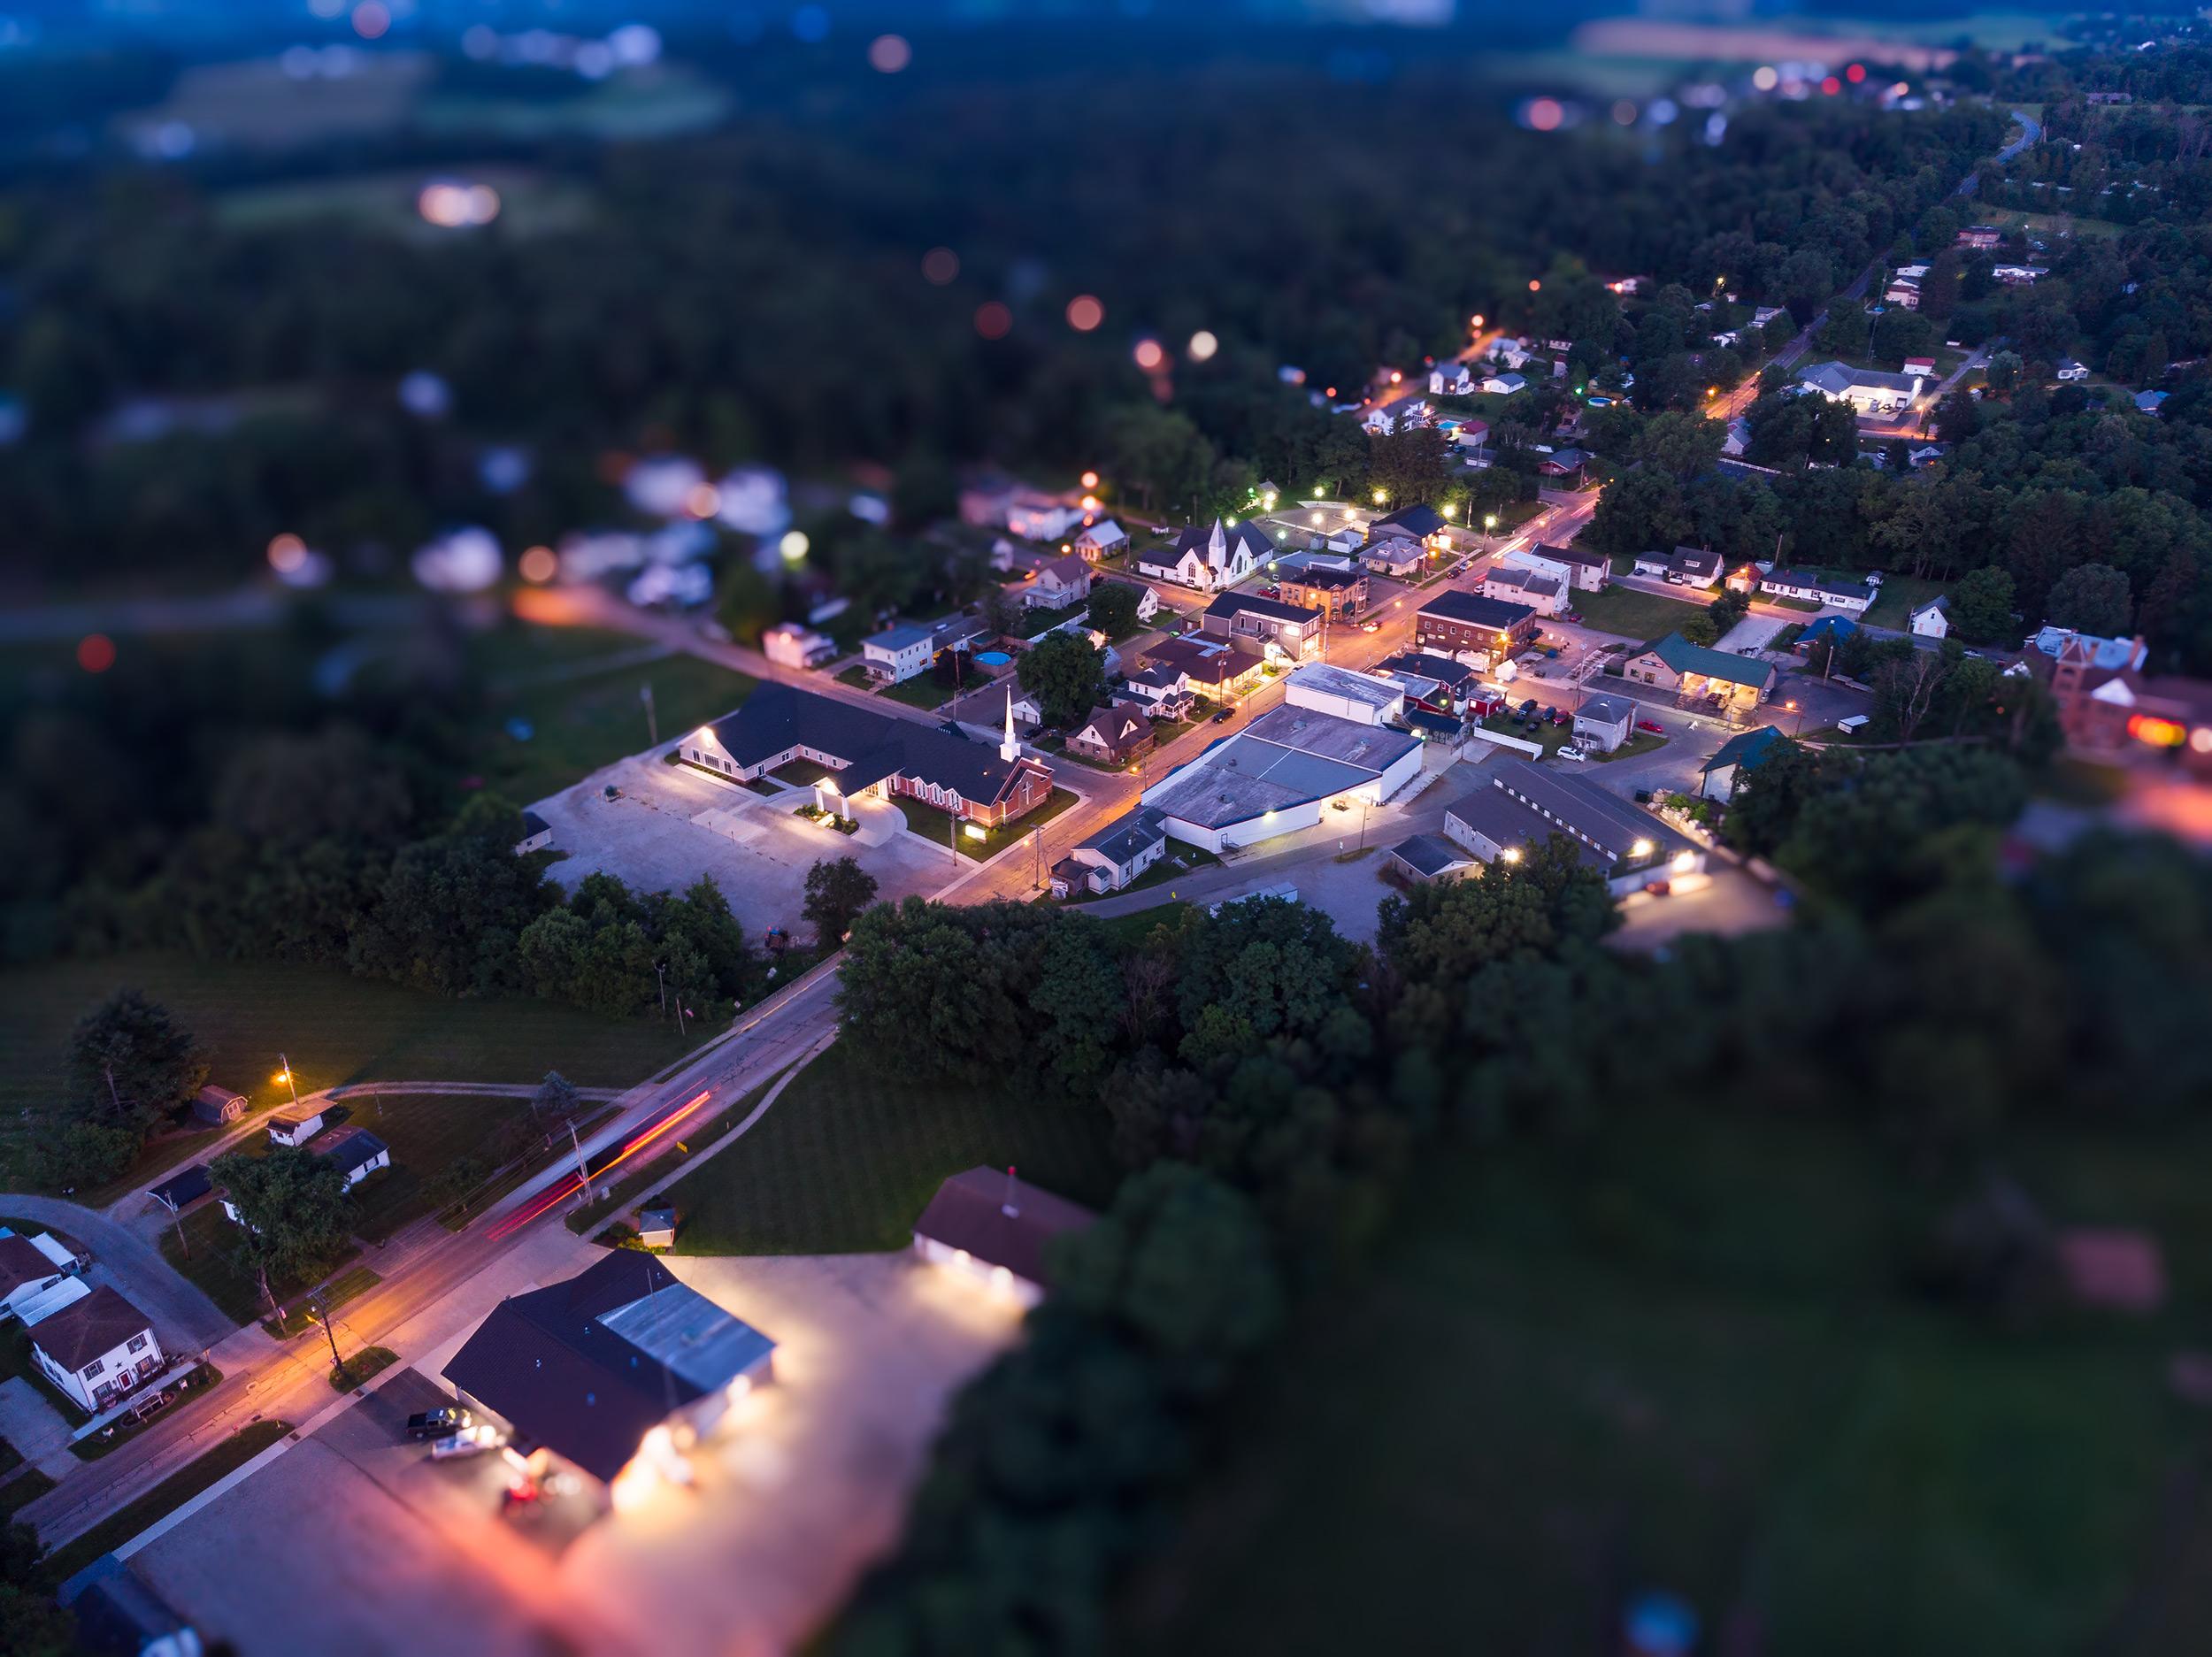 20180704-Fredericksburg-Independence-Day-0124-Edit.jpg